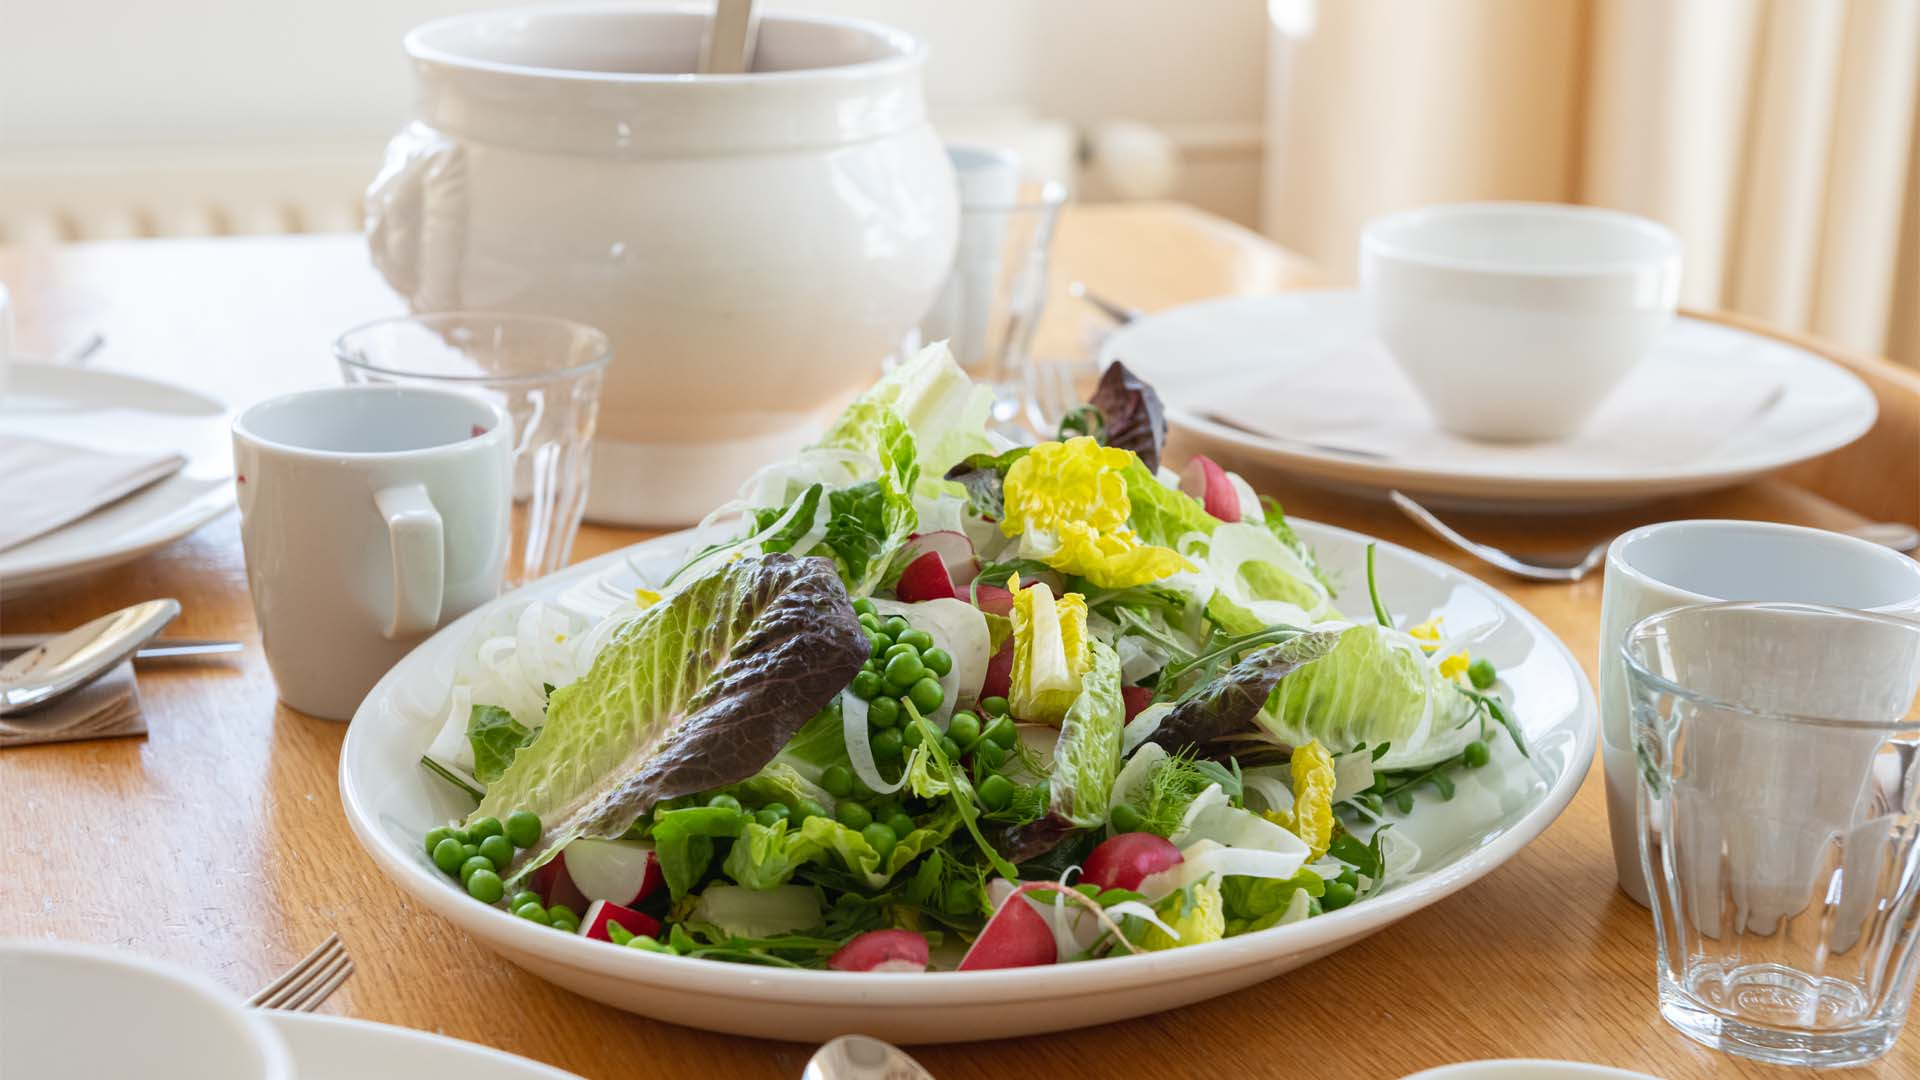 Kloosterhotel ZIN lunch salade samen kloostertafel gezond biologisch duurzaam